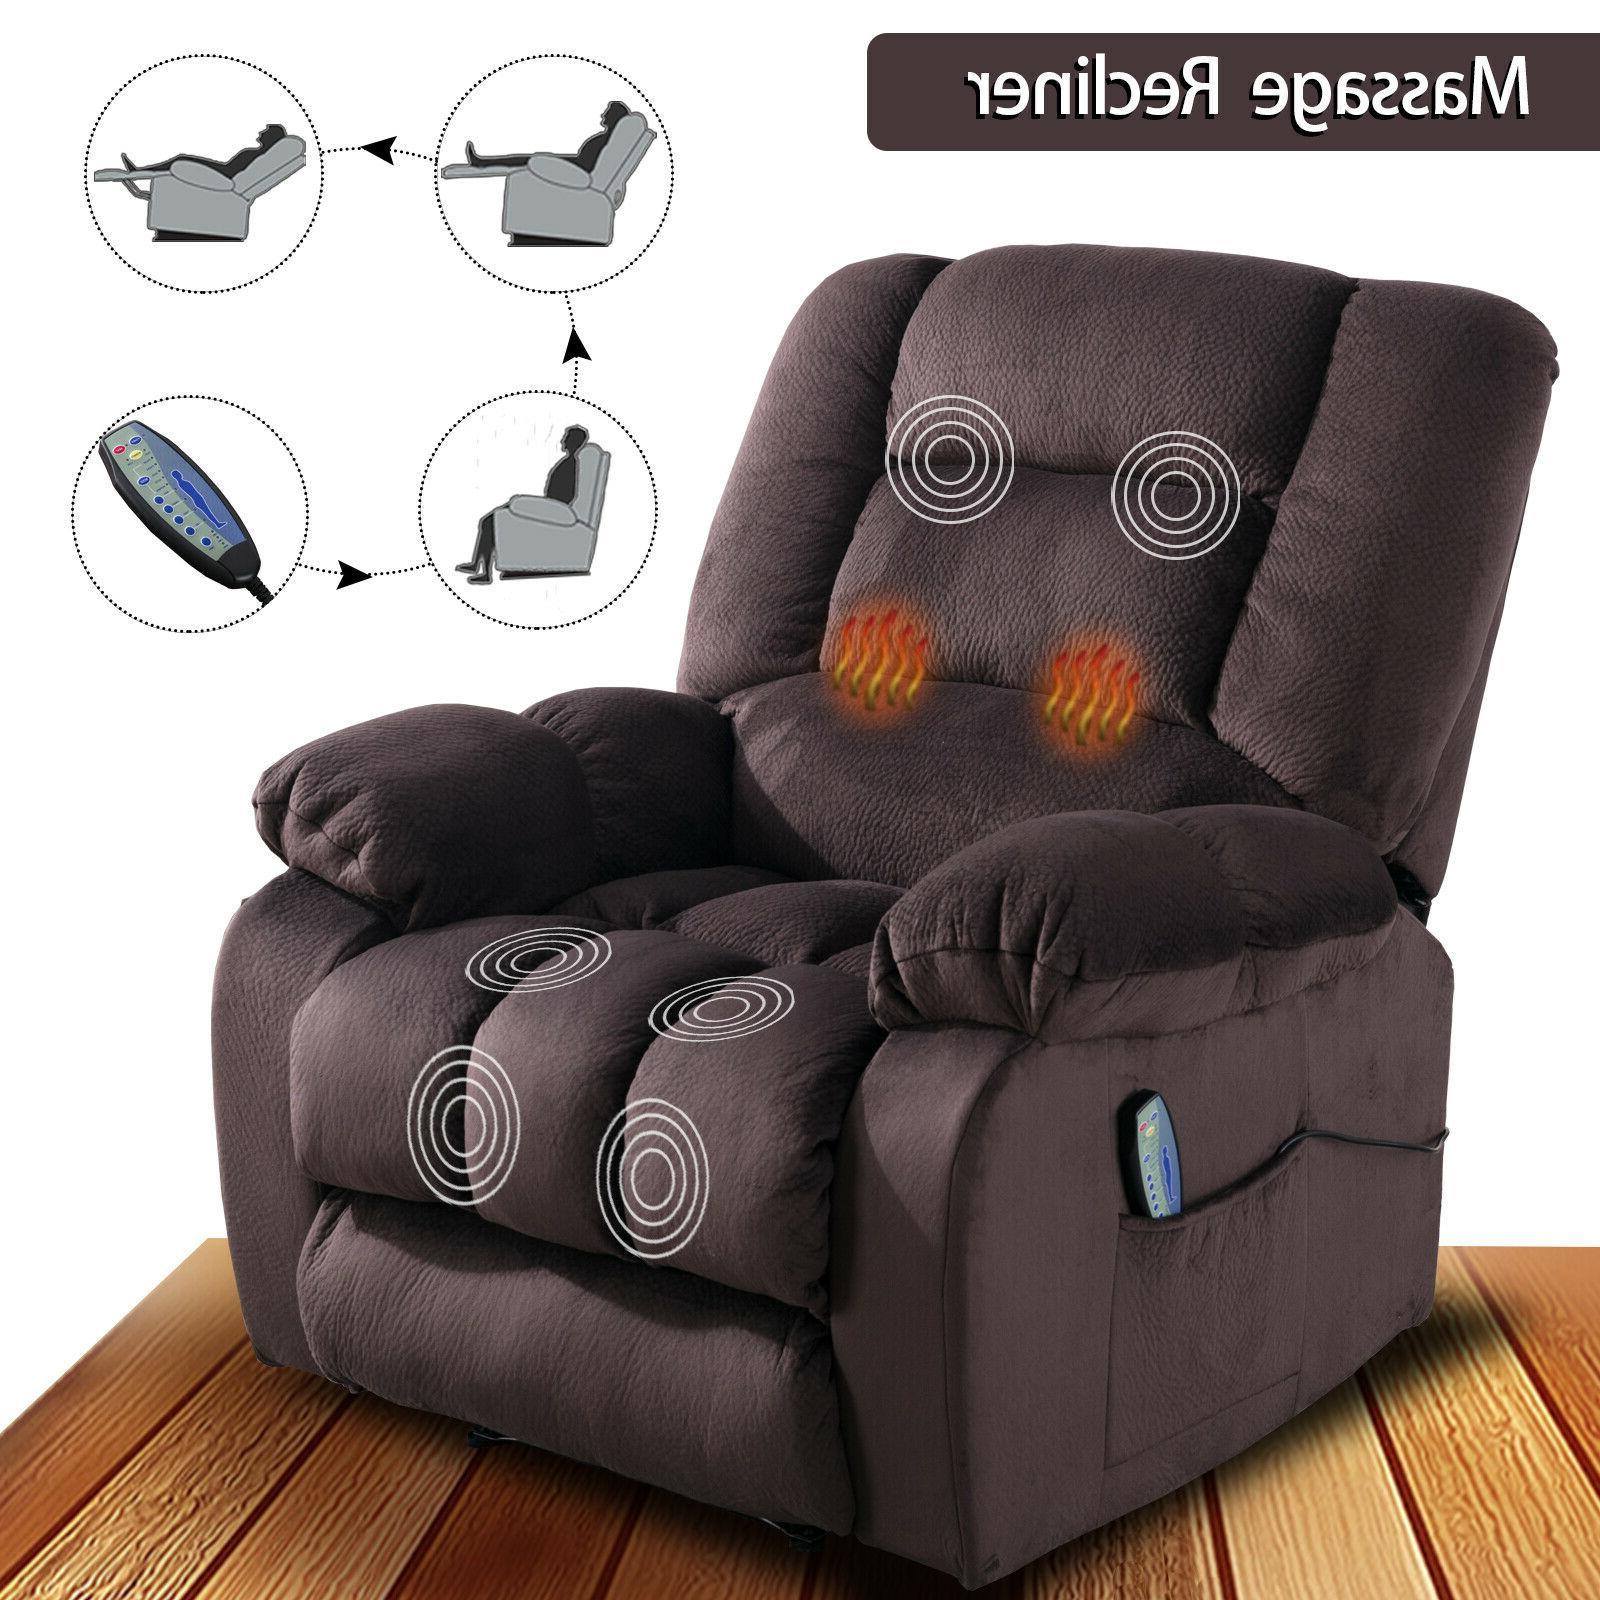 oversized massage chair sofa w heated vibration